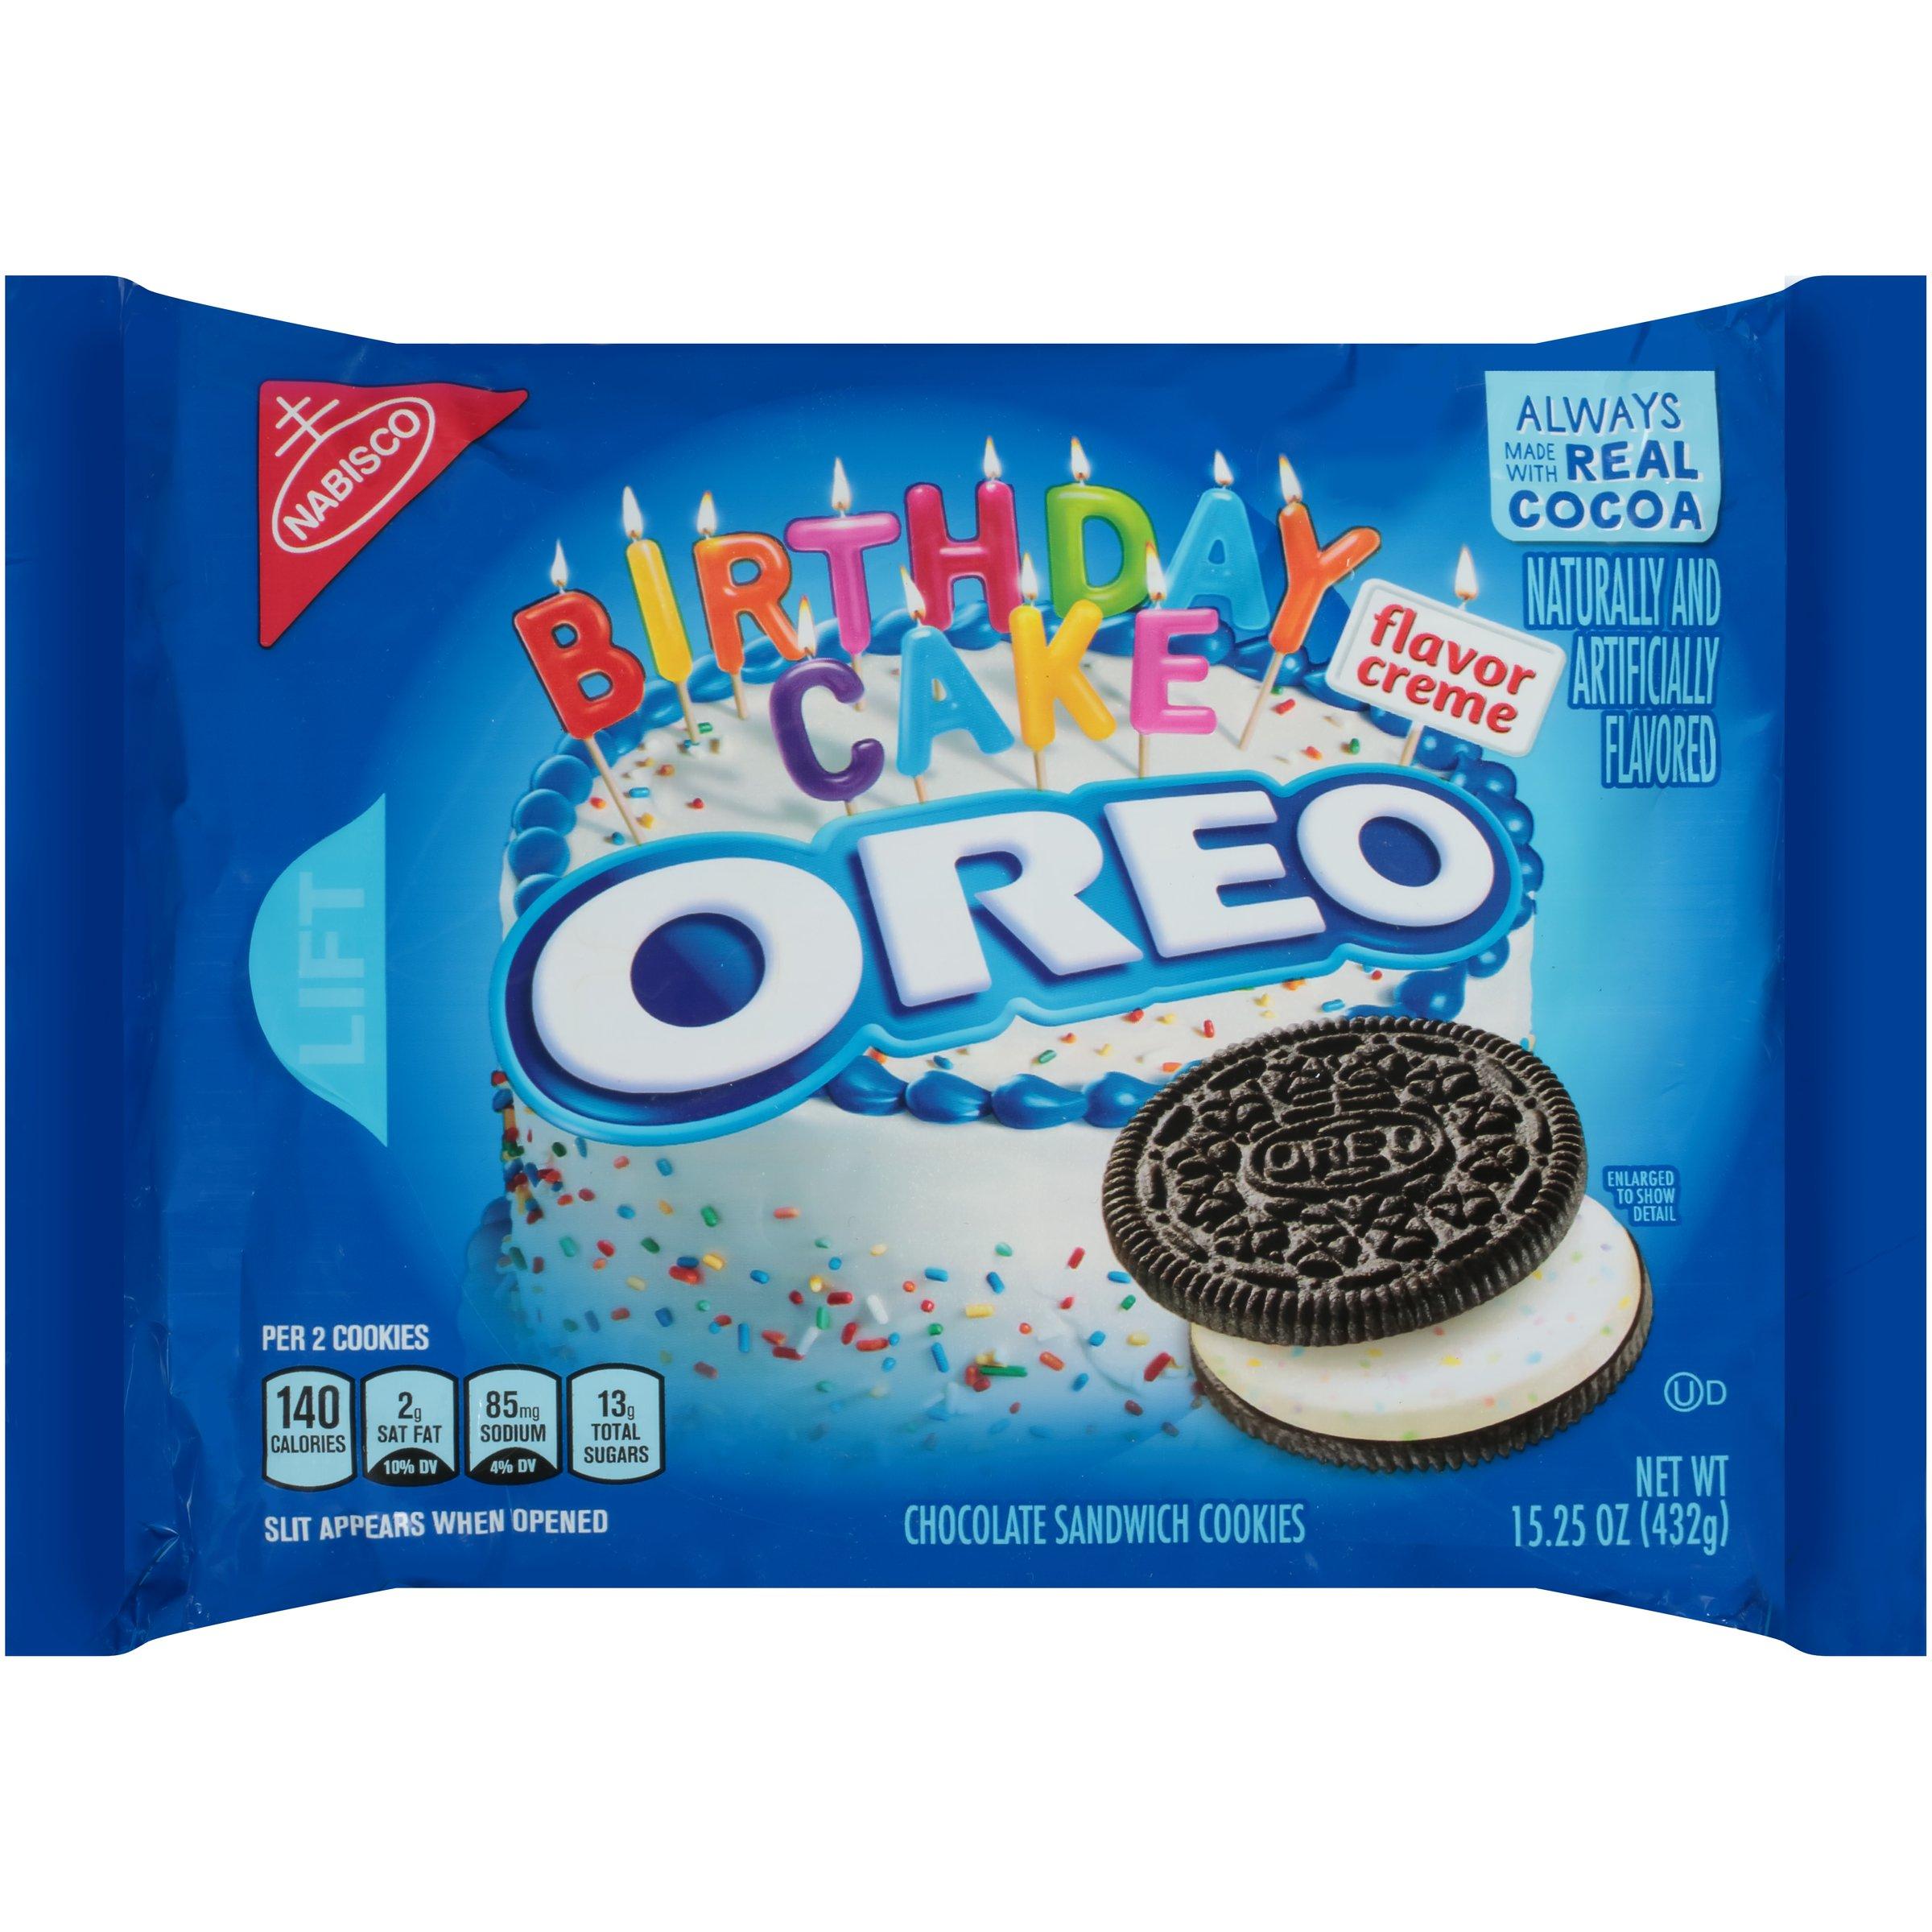 Strange Nabisco Oreo Birthday Cake Flavor Creme Chocolate Sandwich Cookies Funny Birthday Cards Online Fluifree Goldxyz